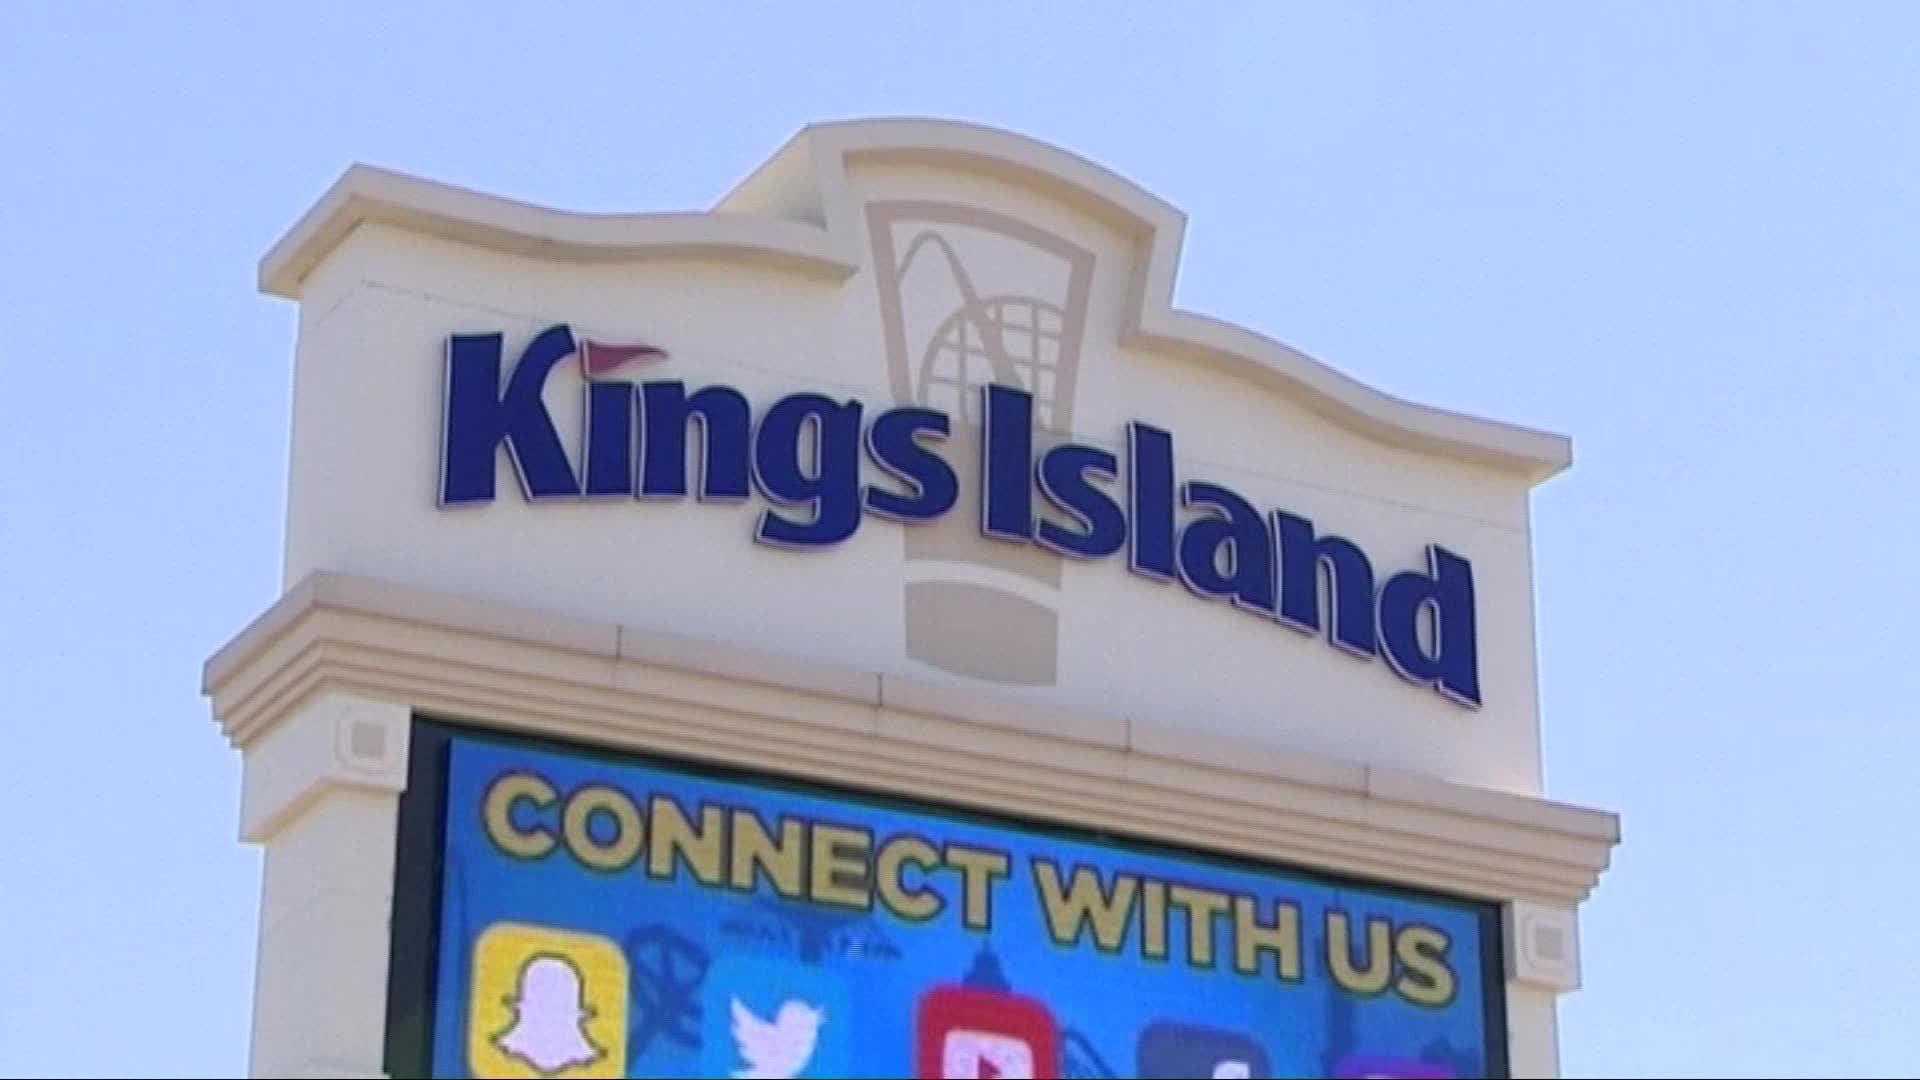 Is The Island Doing Halloween This Year 2020 Kings Island cancels Halloween Haunt, WinterFest for 2020 season